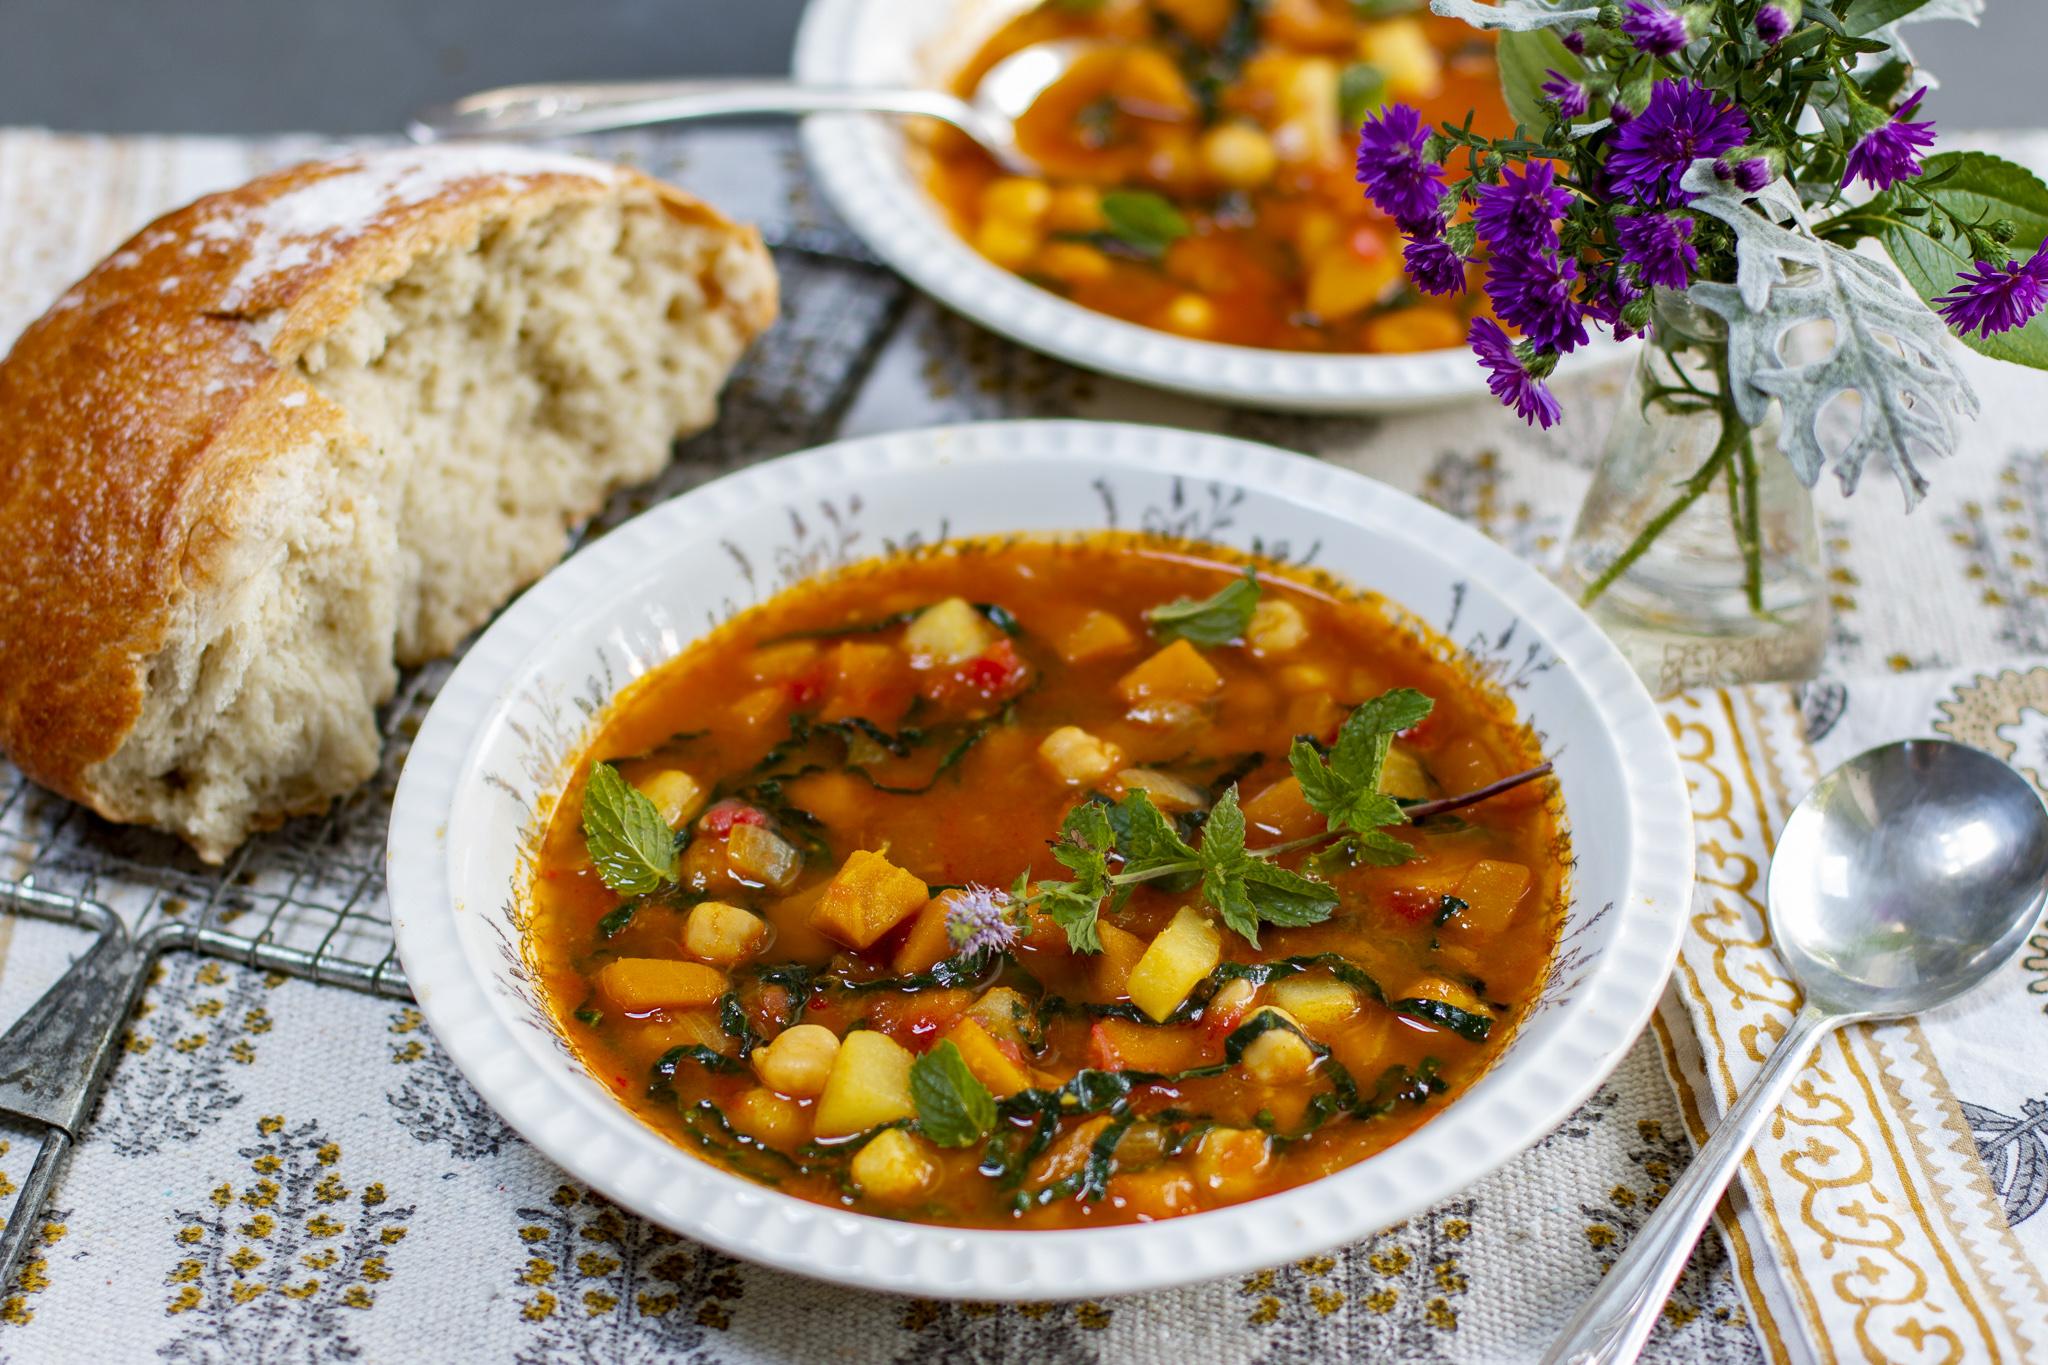 Mediterranean Gypsy Soup